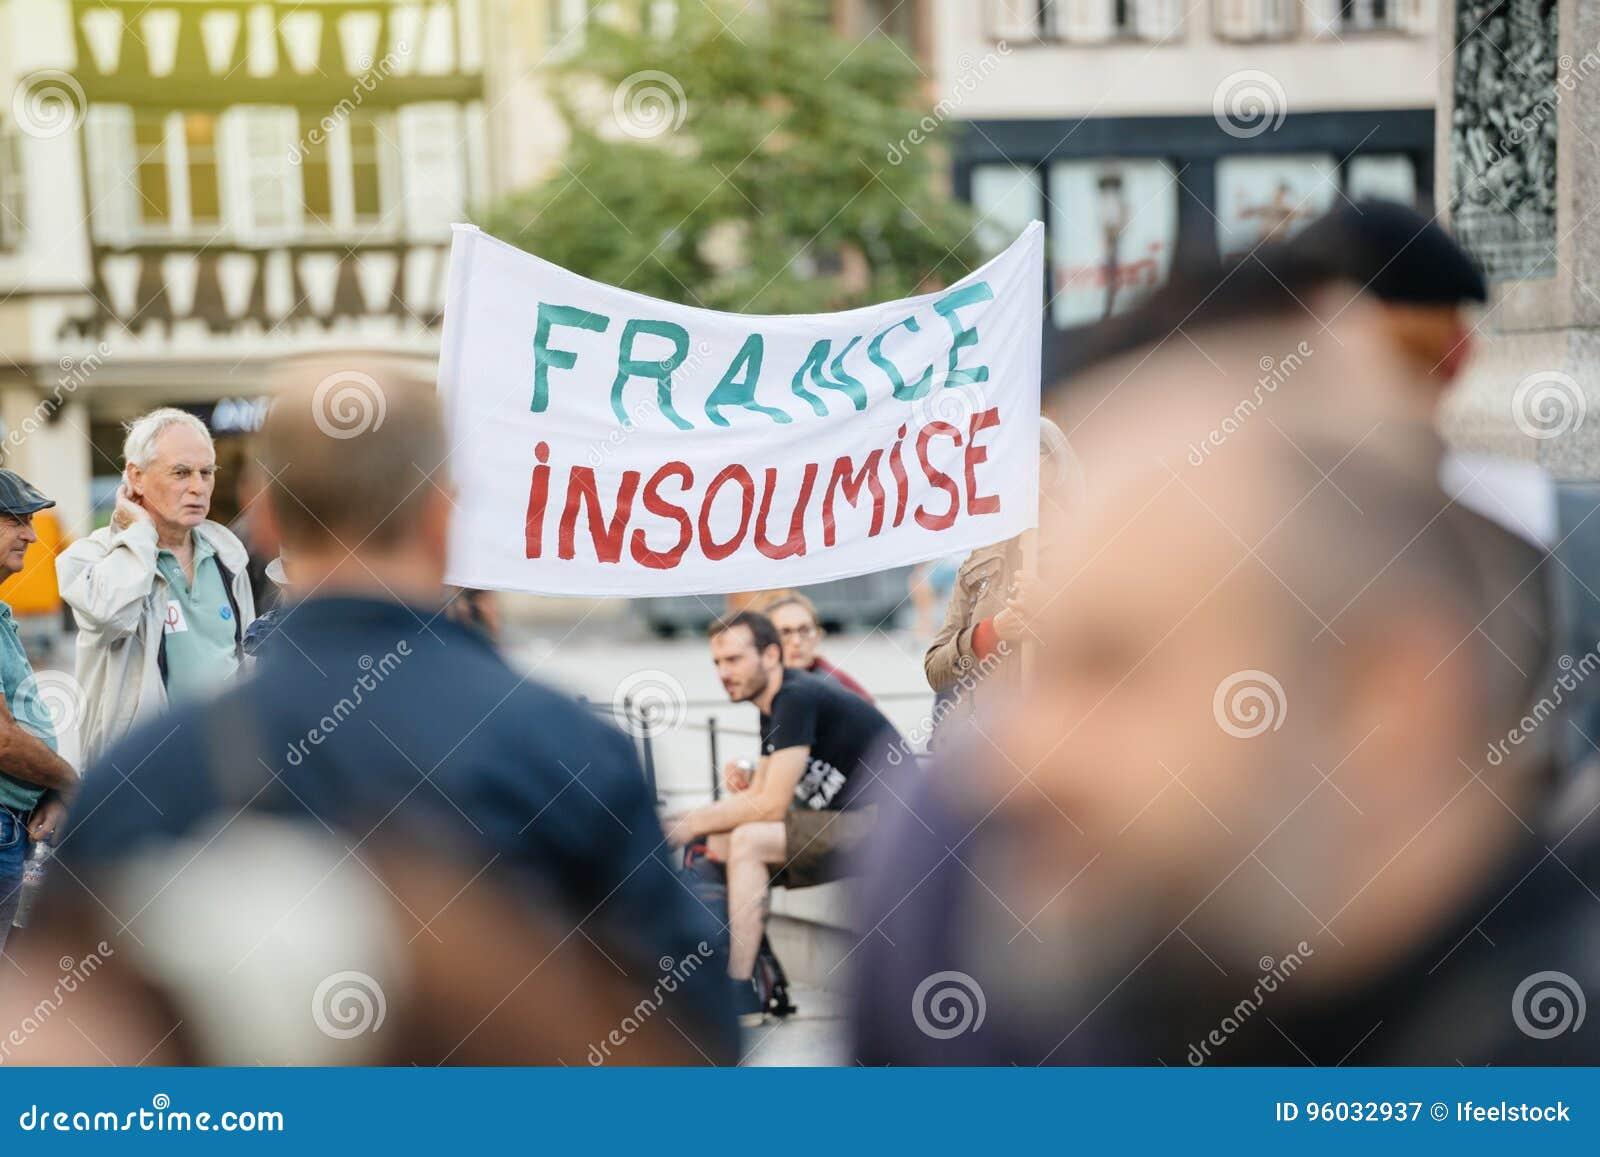 Francja insoumise plakat przy protestem w France